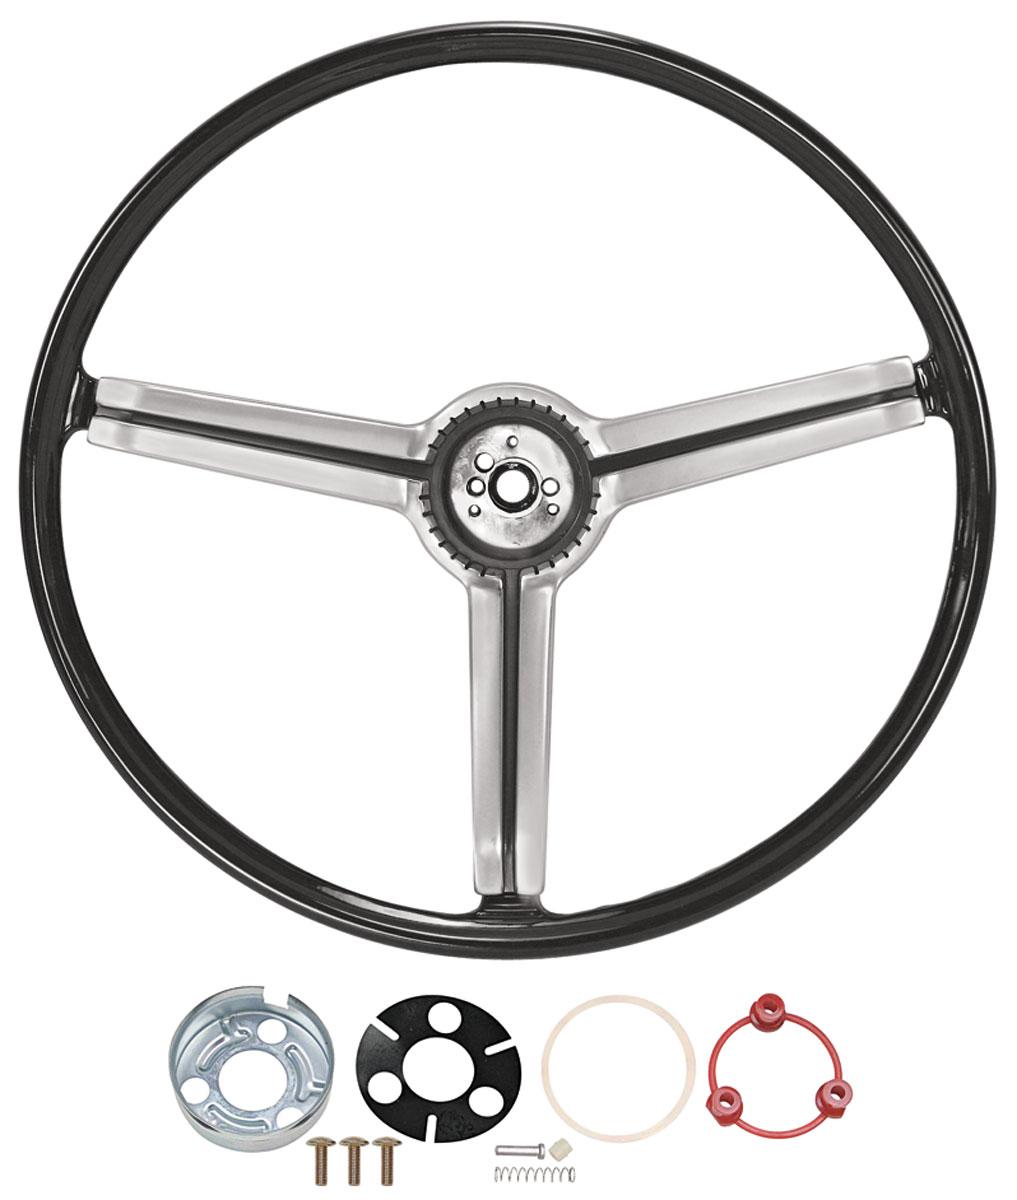 Photo of Steering Wheel Kit, 1968 Deluxe